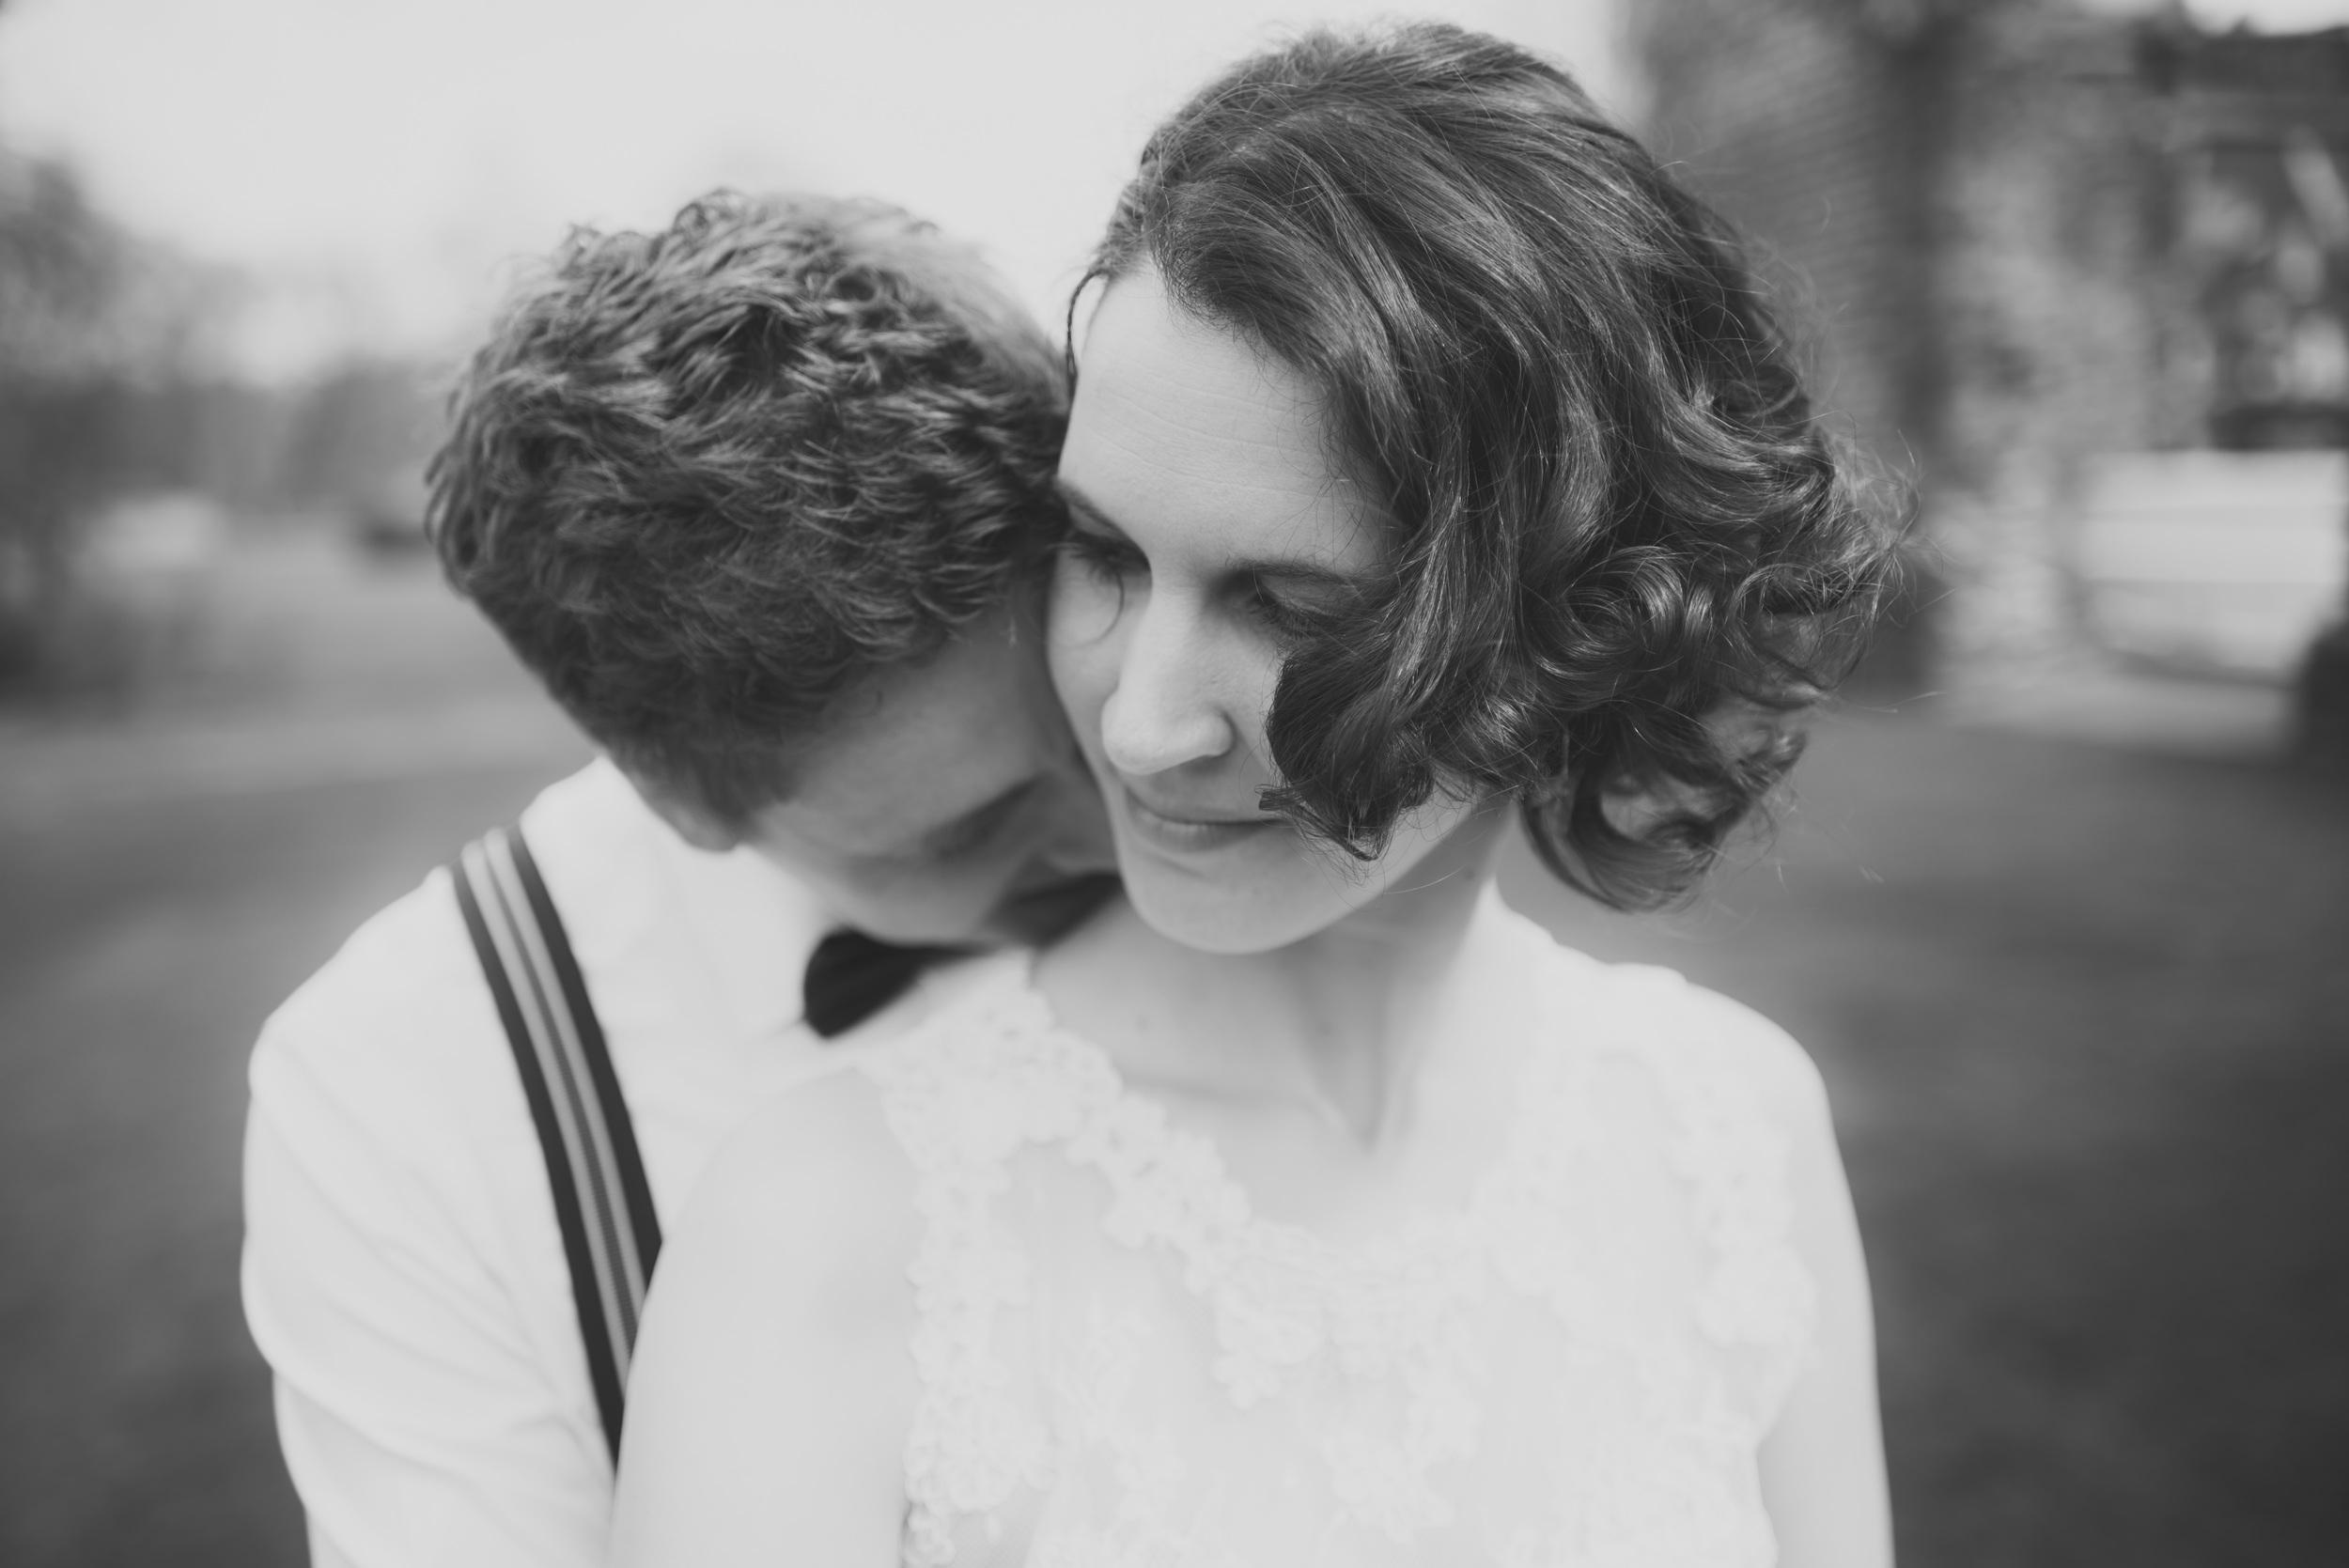 Hochzeitsfotograf-Schlossruine-Hertefeld-Weeze-024.jpg